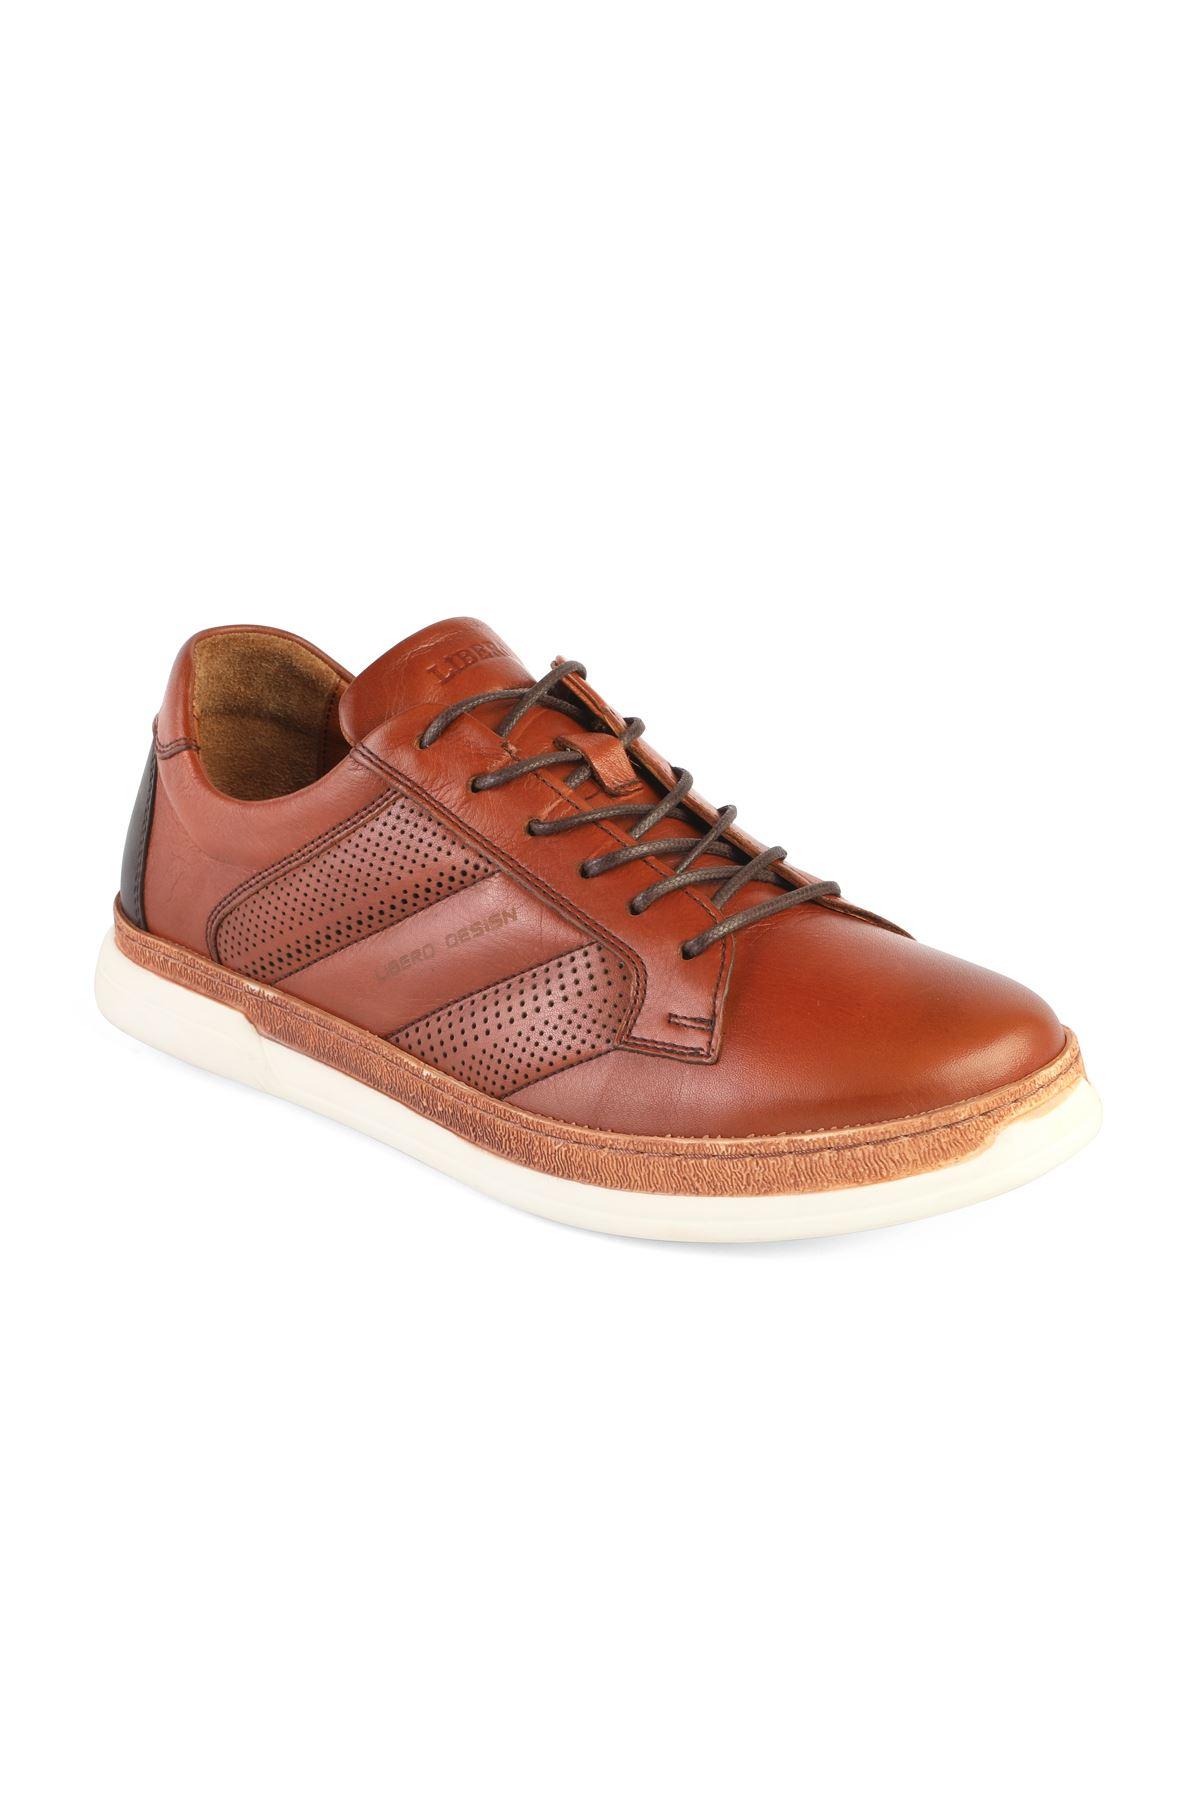 Libero 3308 Tan Casual Shoes